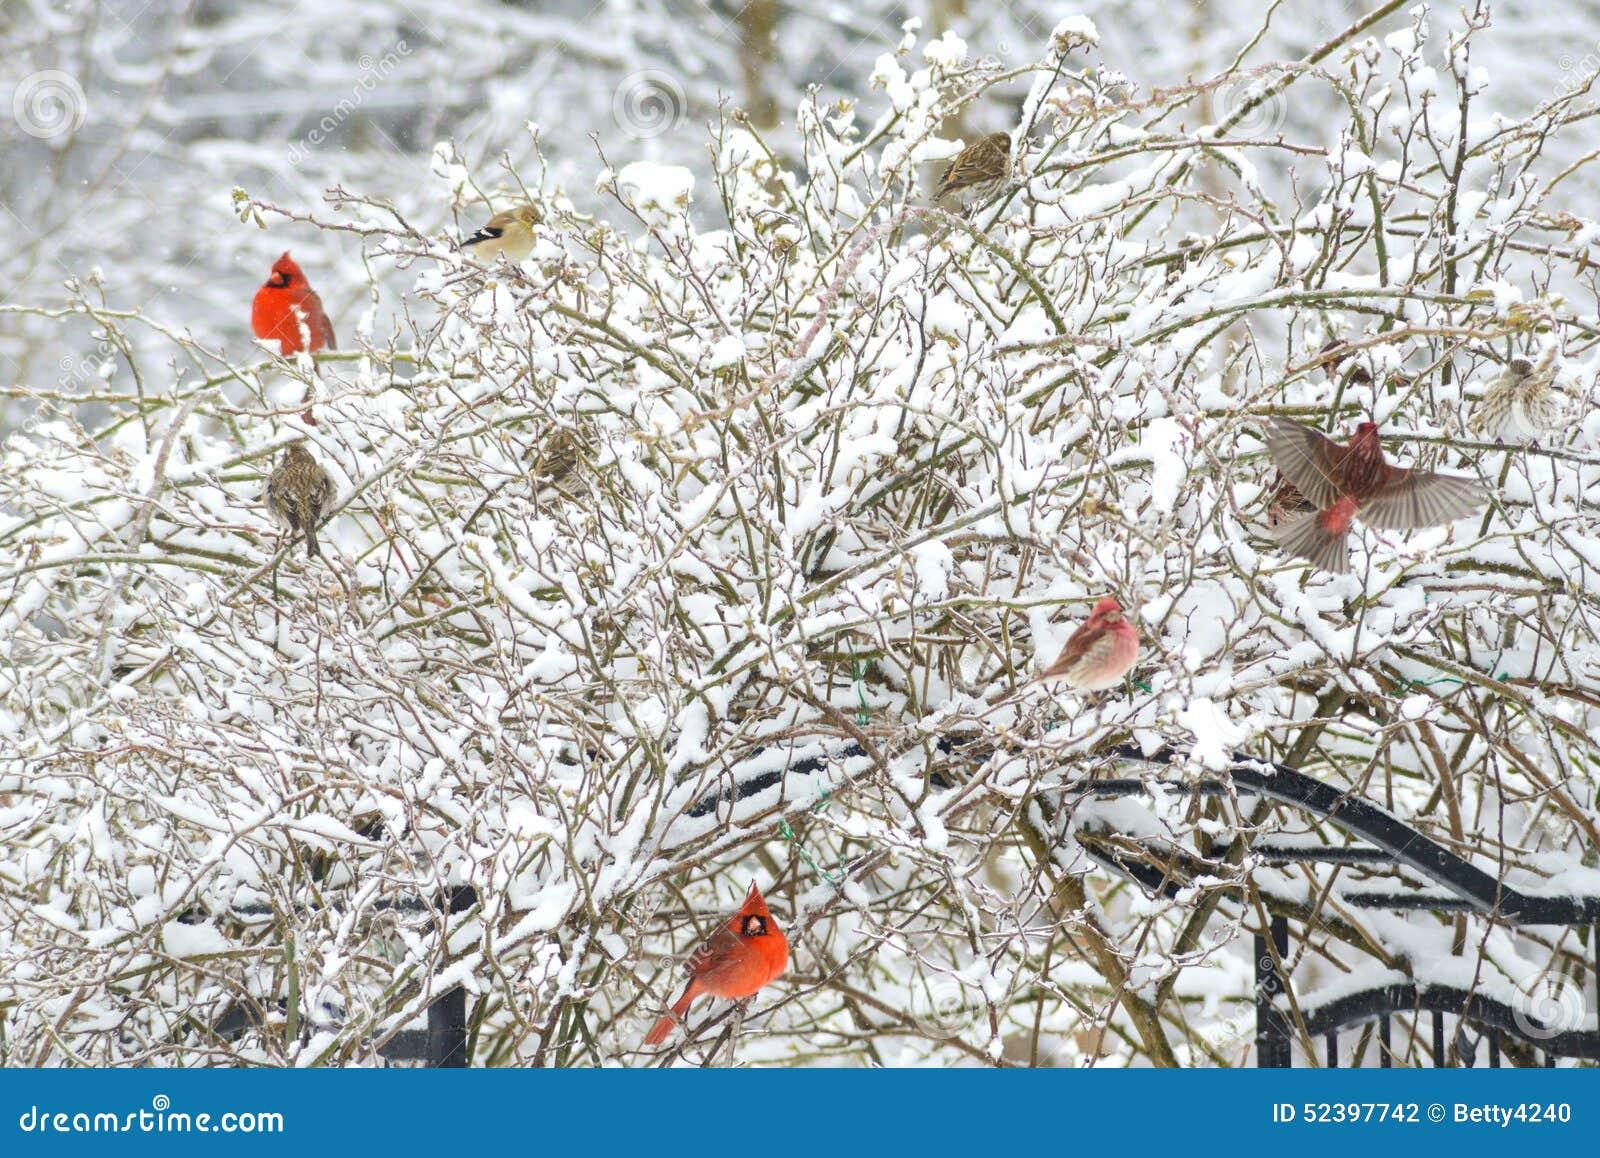 Snowy Rose Bush Full Of Songbirds Stock Photo Image Of